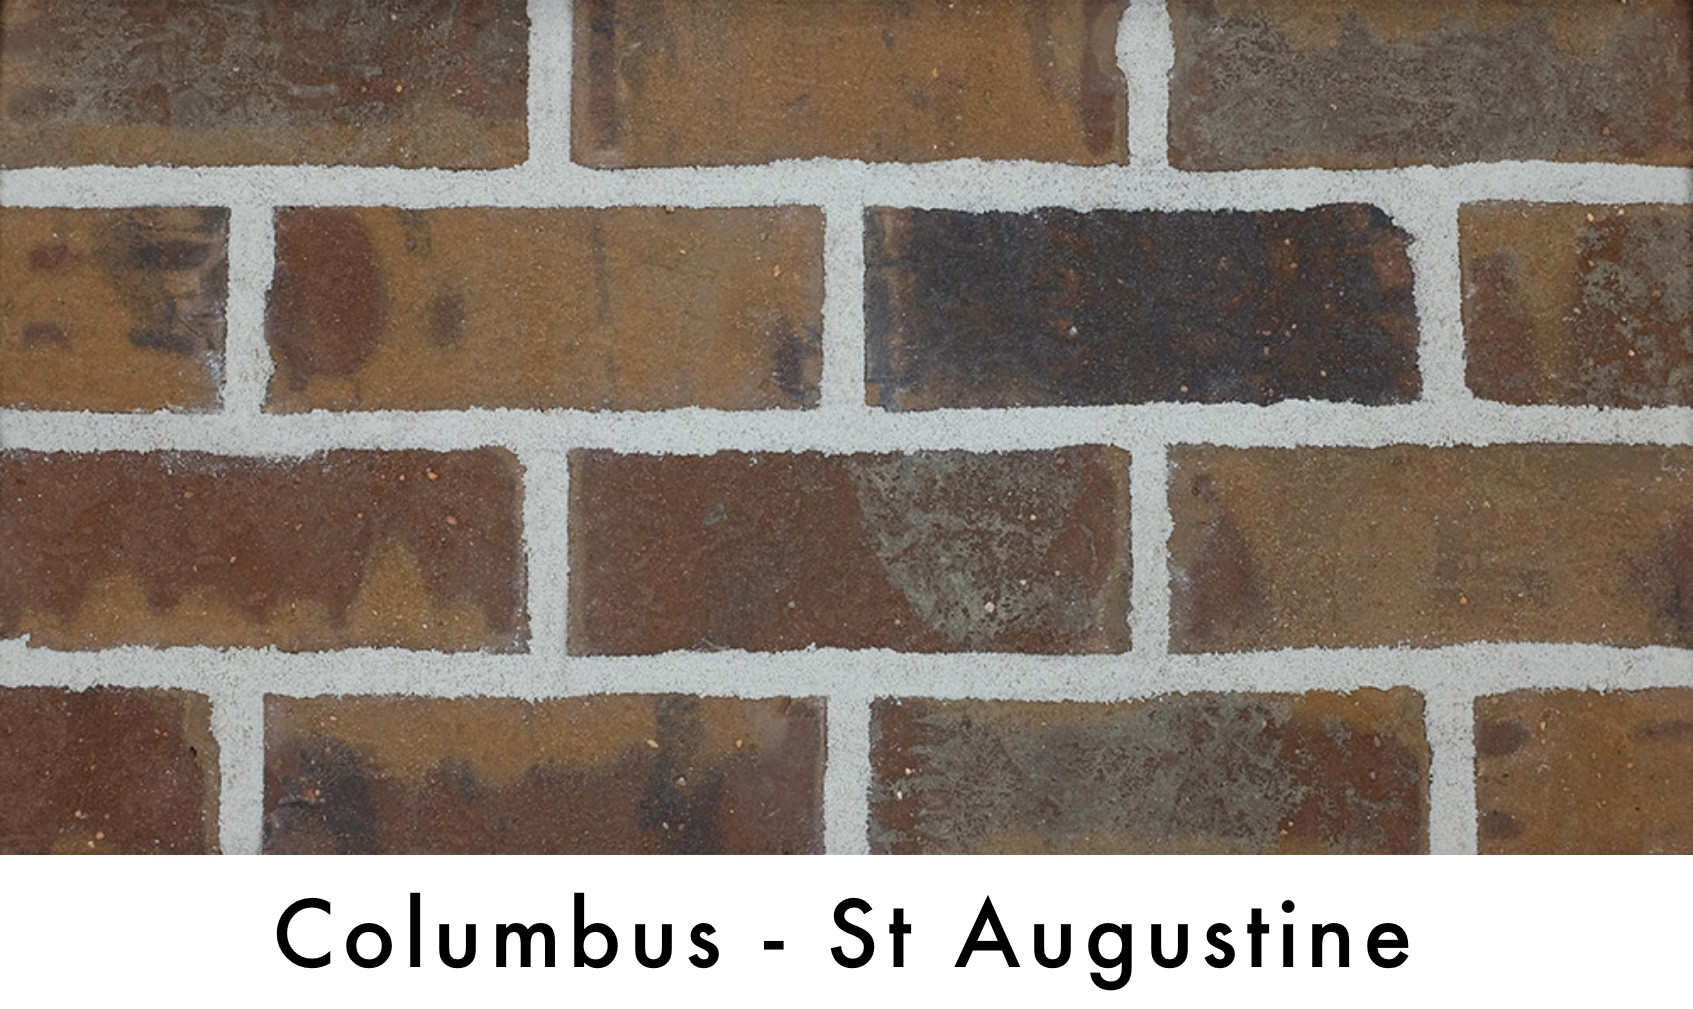 Columbus Brick - St. Augustine